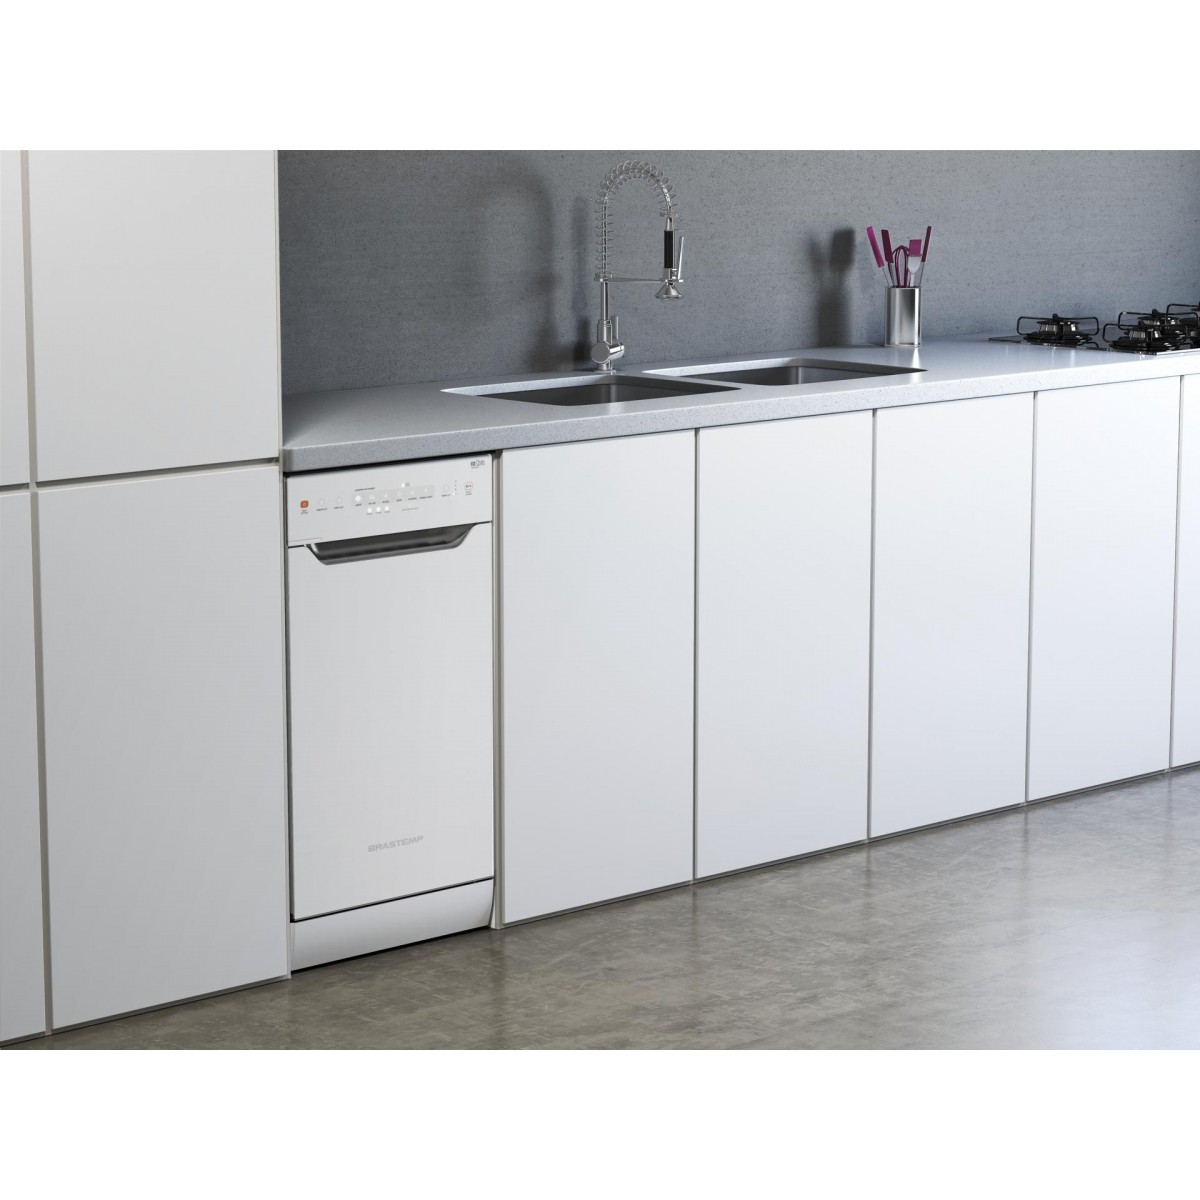 Lava-louças Brastemp 10 Serviços - BLF10AB